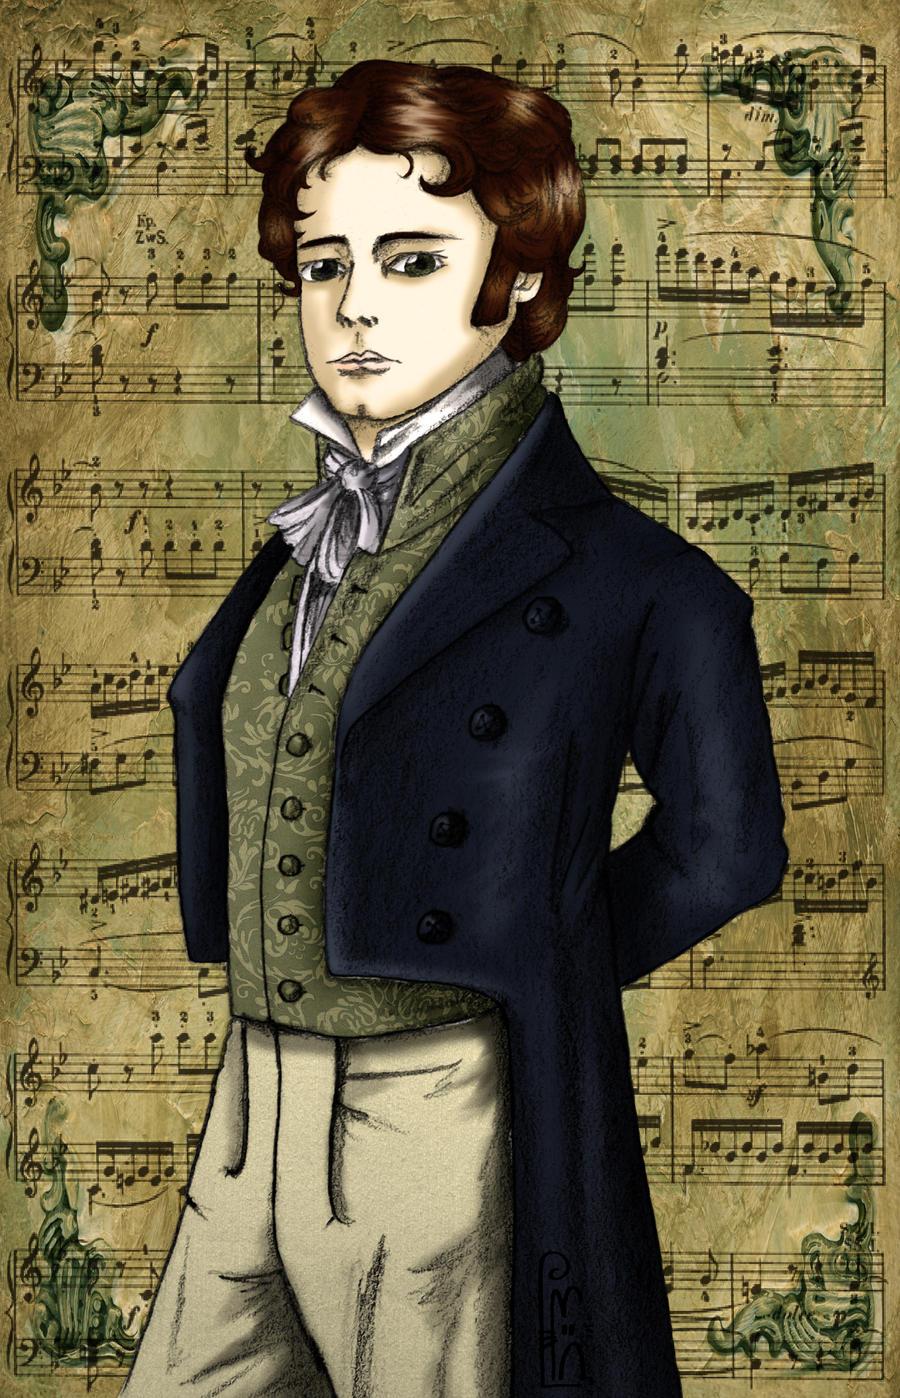 the proud mr darcy by deerdandy on deviantart